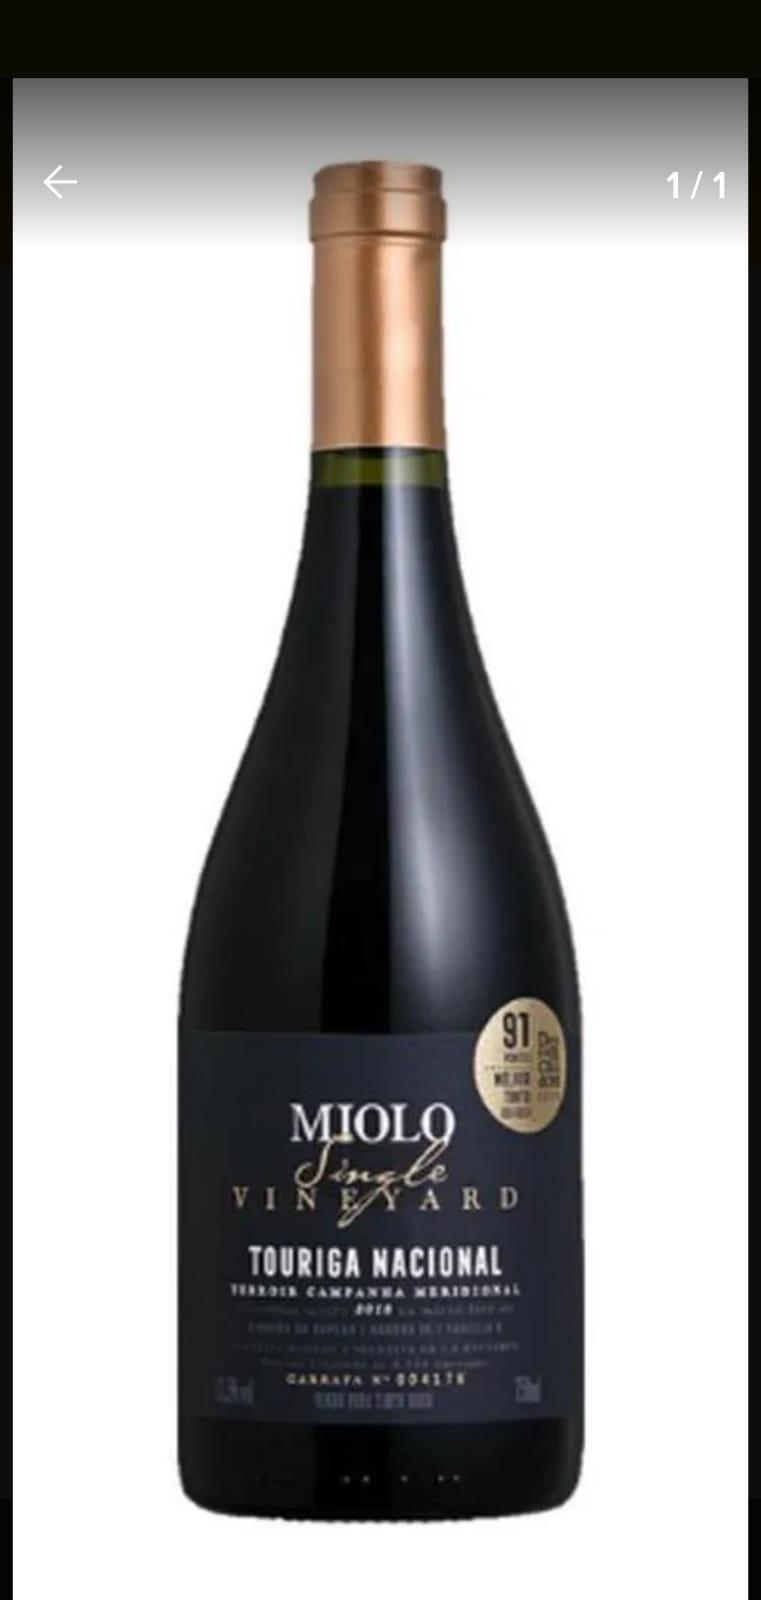 Vinho Tinto Miolo Single Touriga nacional 750ml